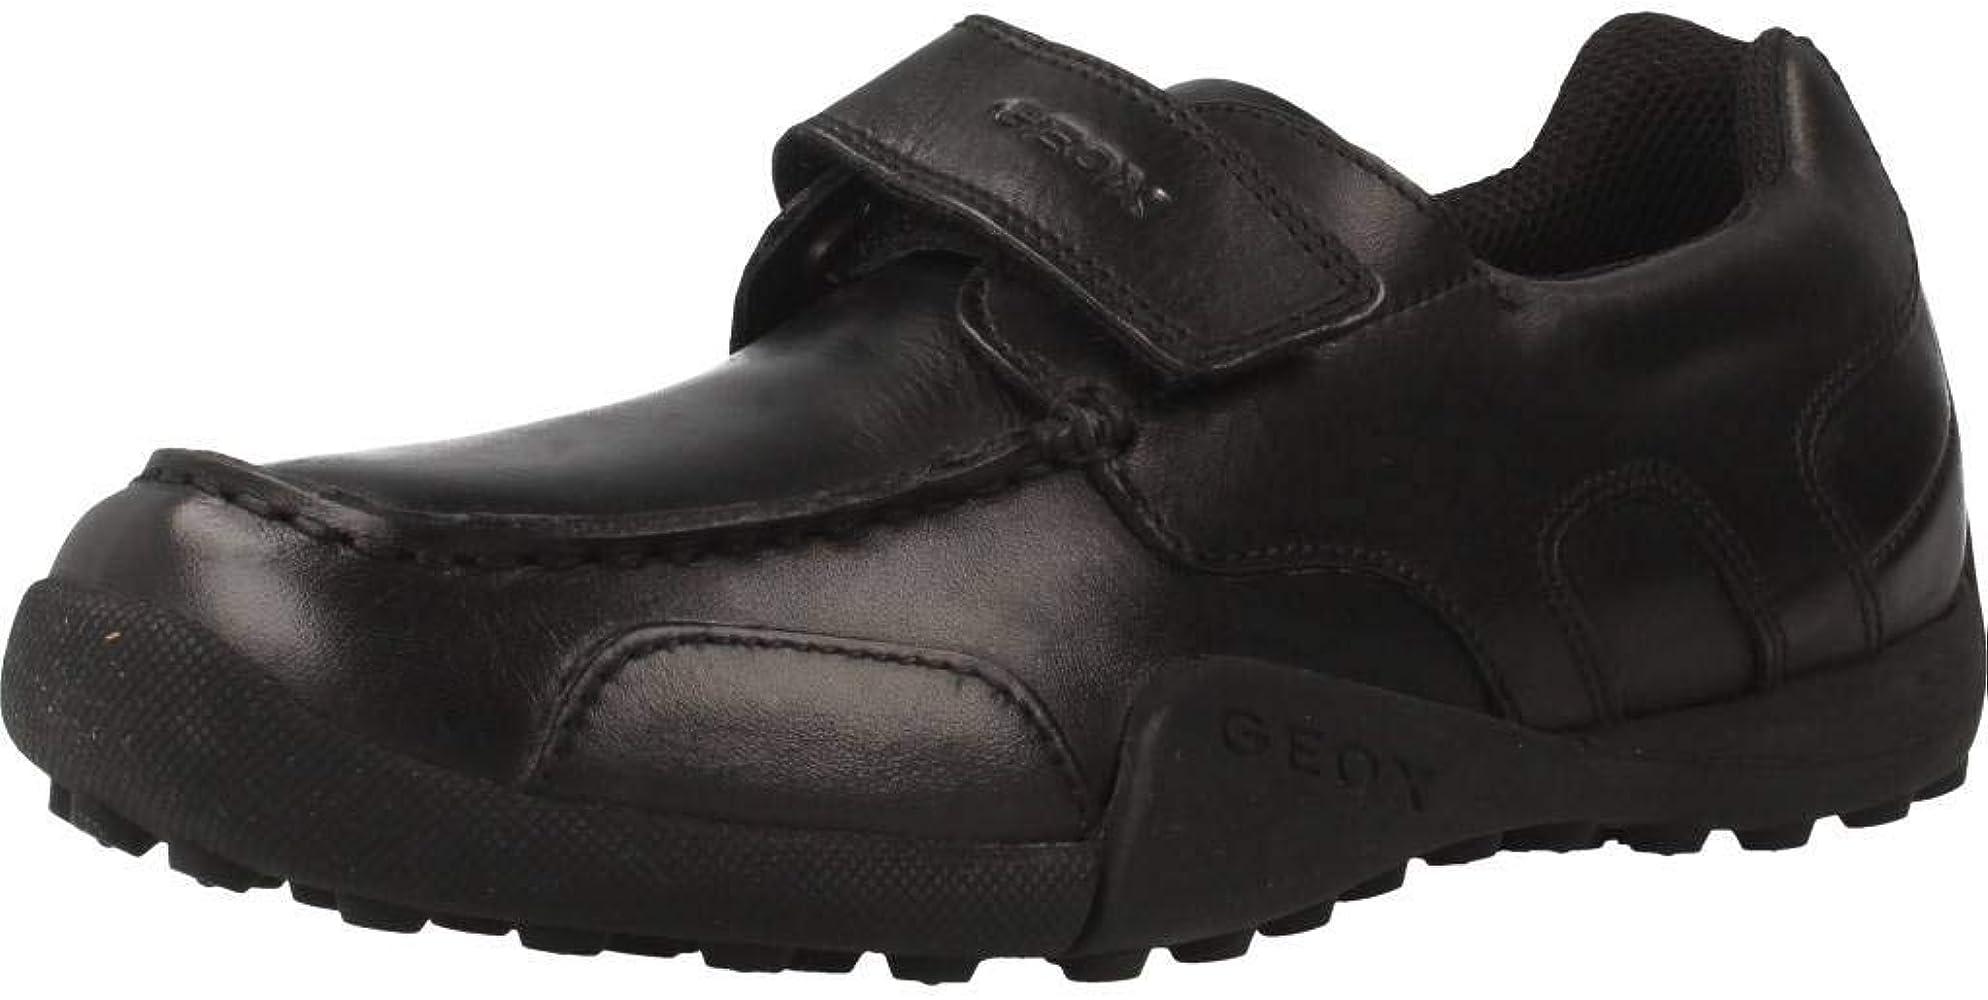 Zapatos de Cordones para niño, Color Negro (C9999), Marca GEOX, Modelo Zapatos De Cordones para Niño GEOX W.SNAKEM B Negro